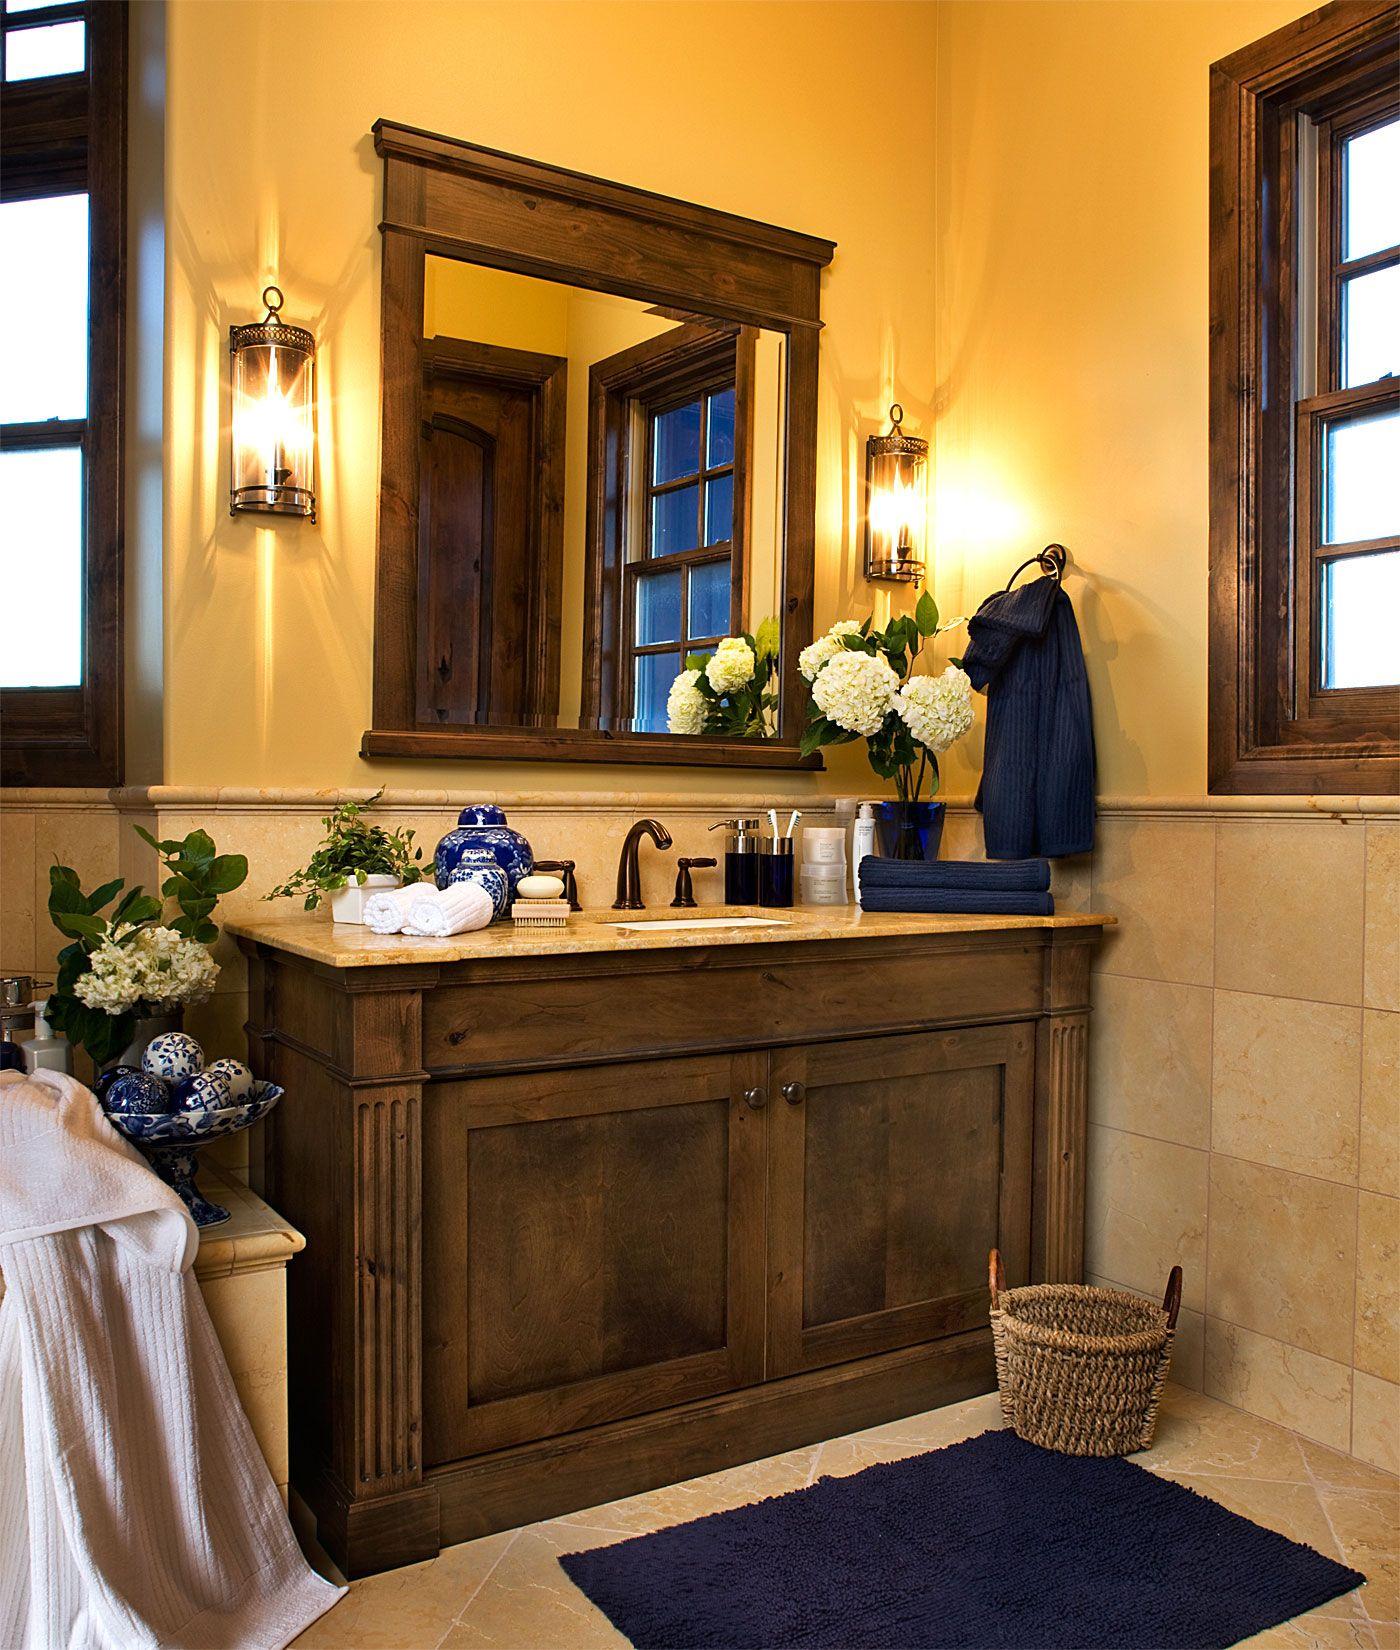 marvelous bathroom design ideas | 25 Marvelous Traditional Bathroom Designs For Your ...